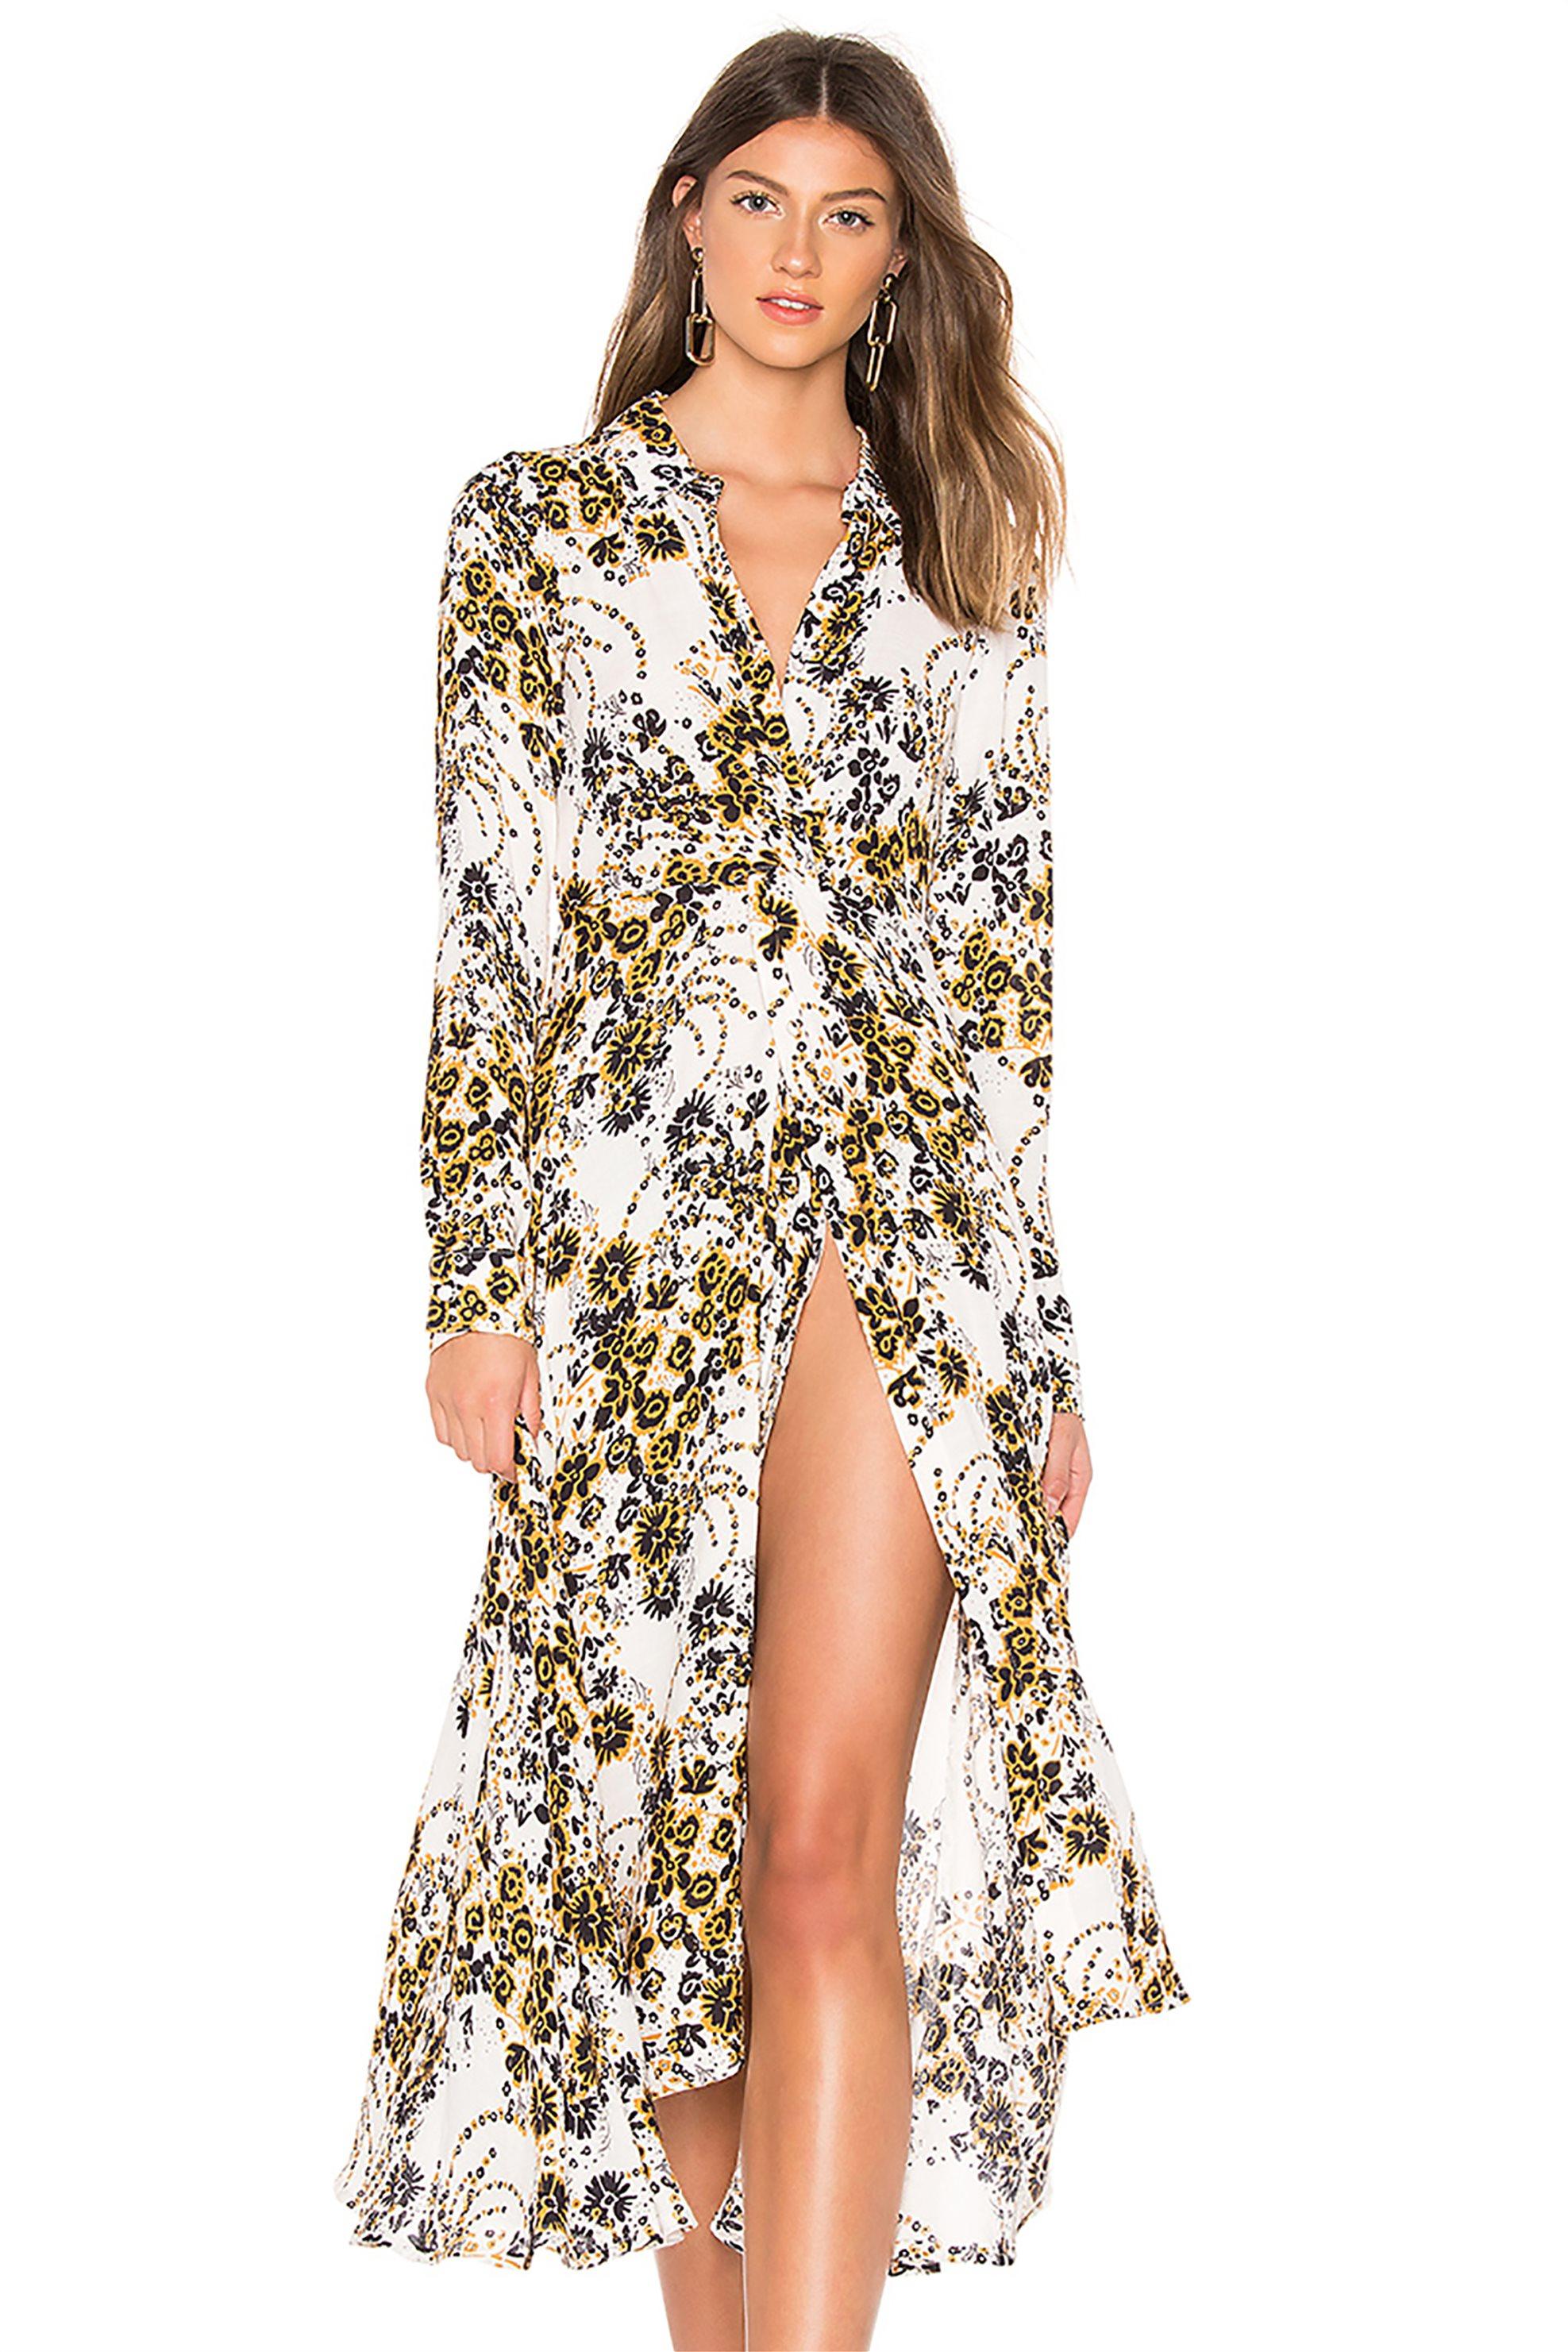 Free People γυναικείο φόρεμα Tough Love Shirtdress - OB872268 - Εκρού γυναικα   ρουχα   φορέματα   midi φορέματα